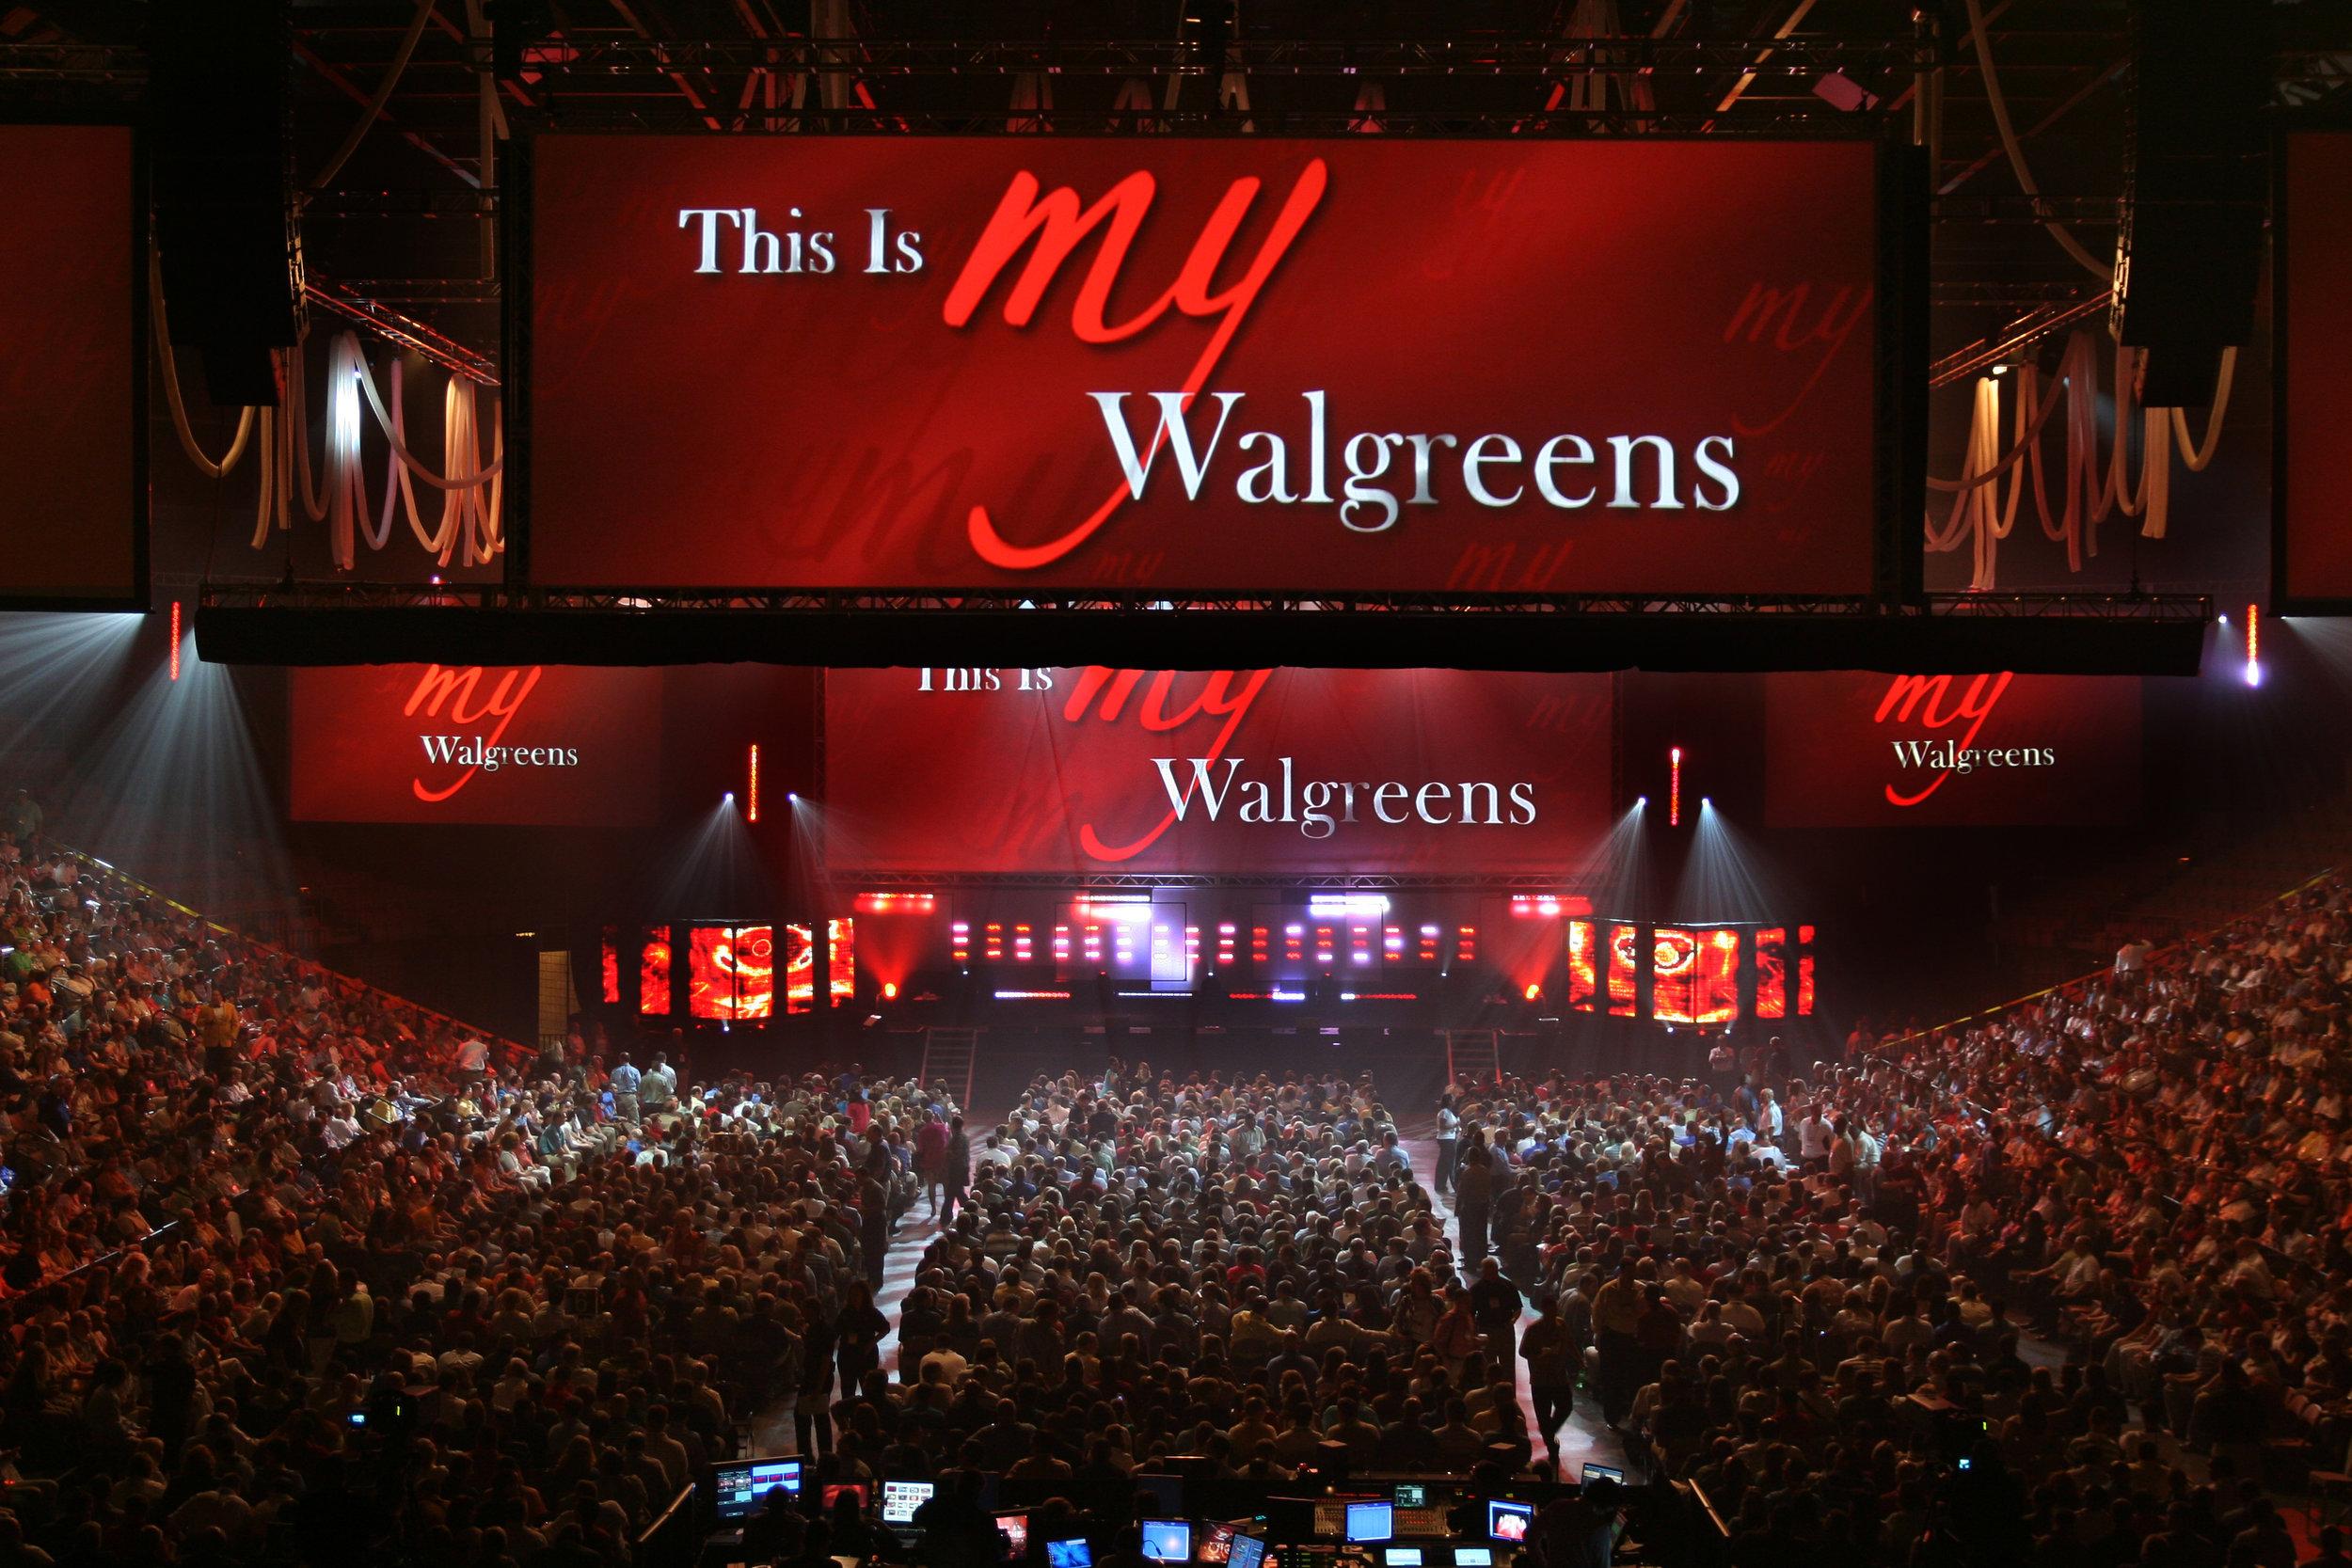 Walgreens3.jpg